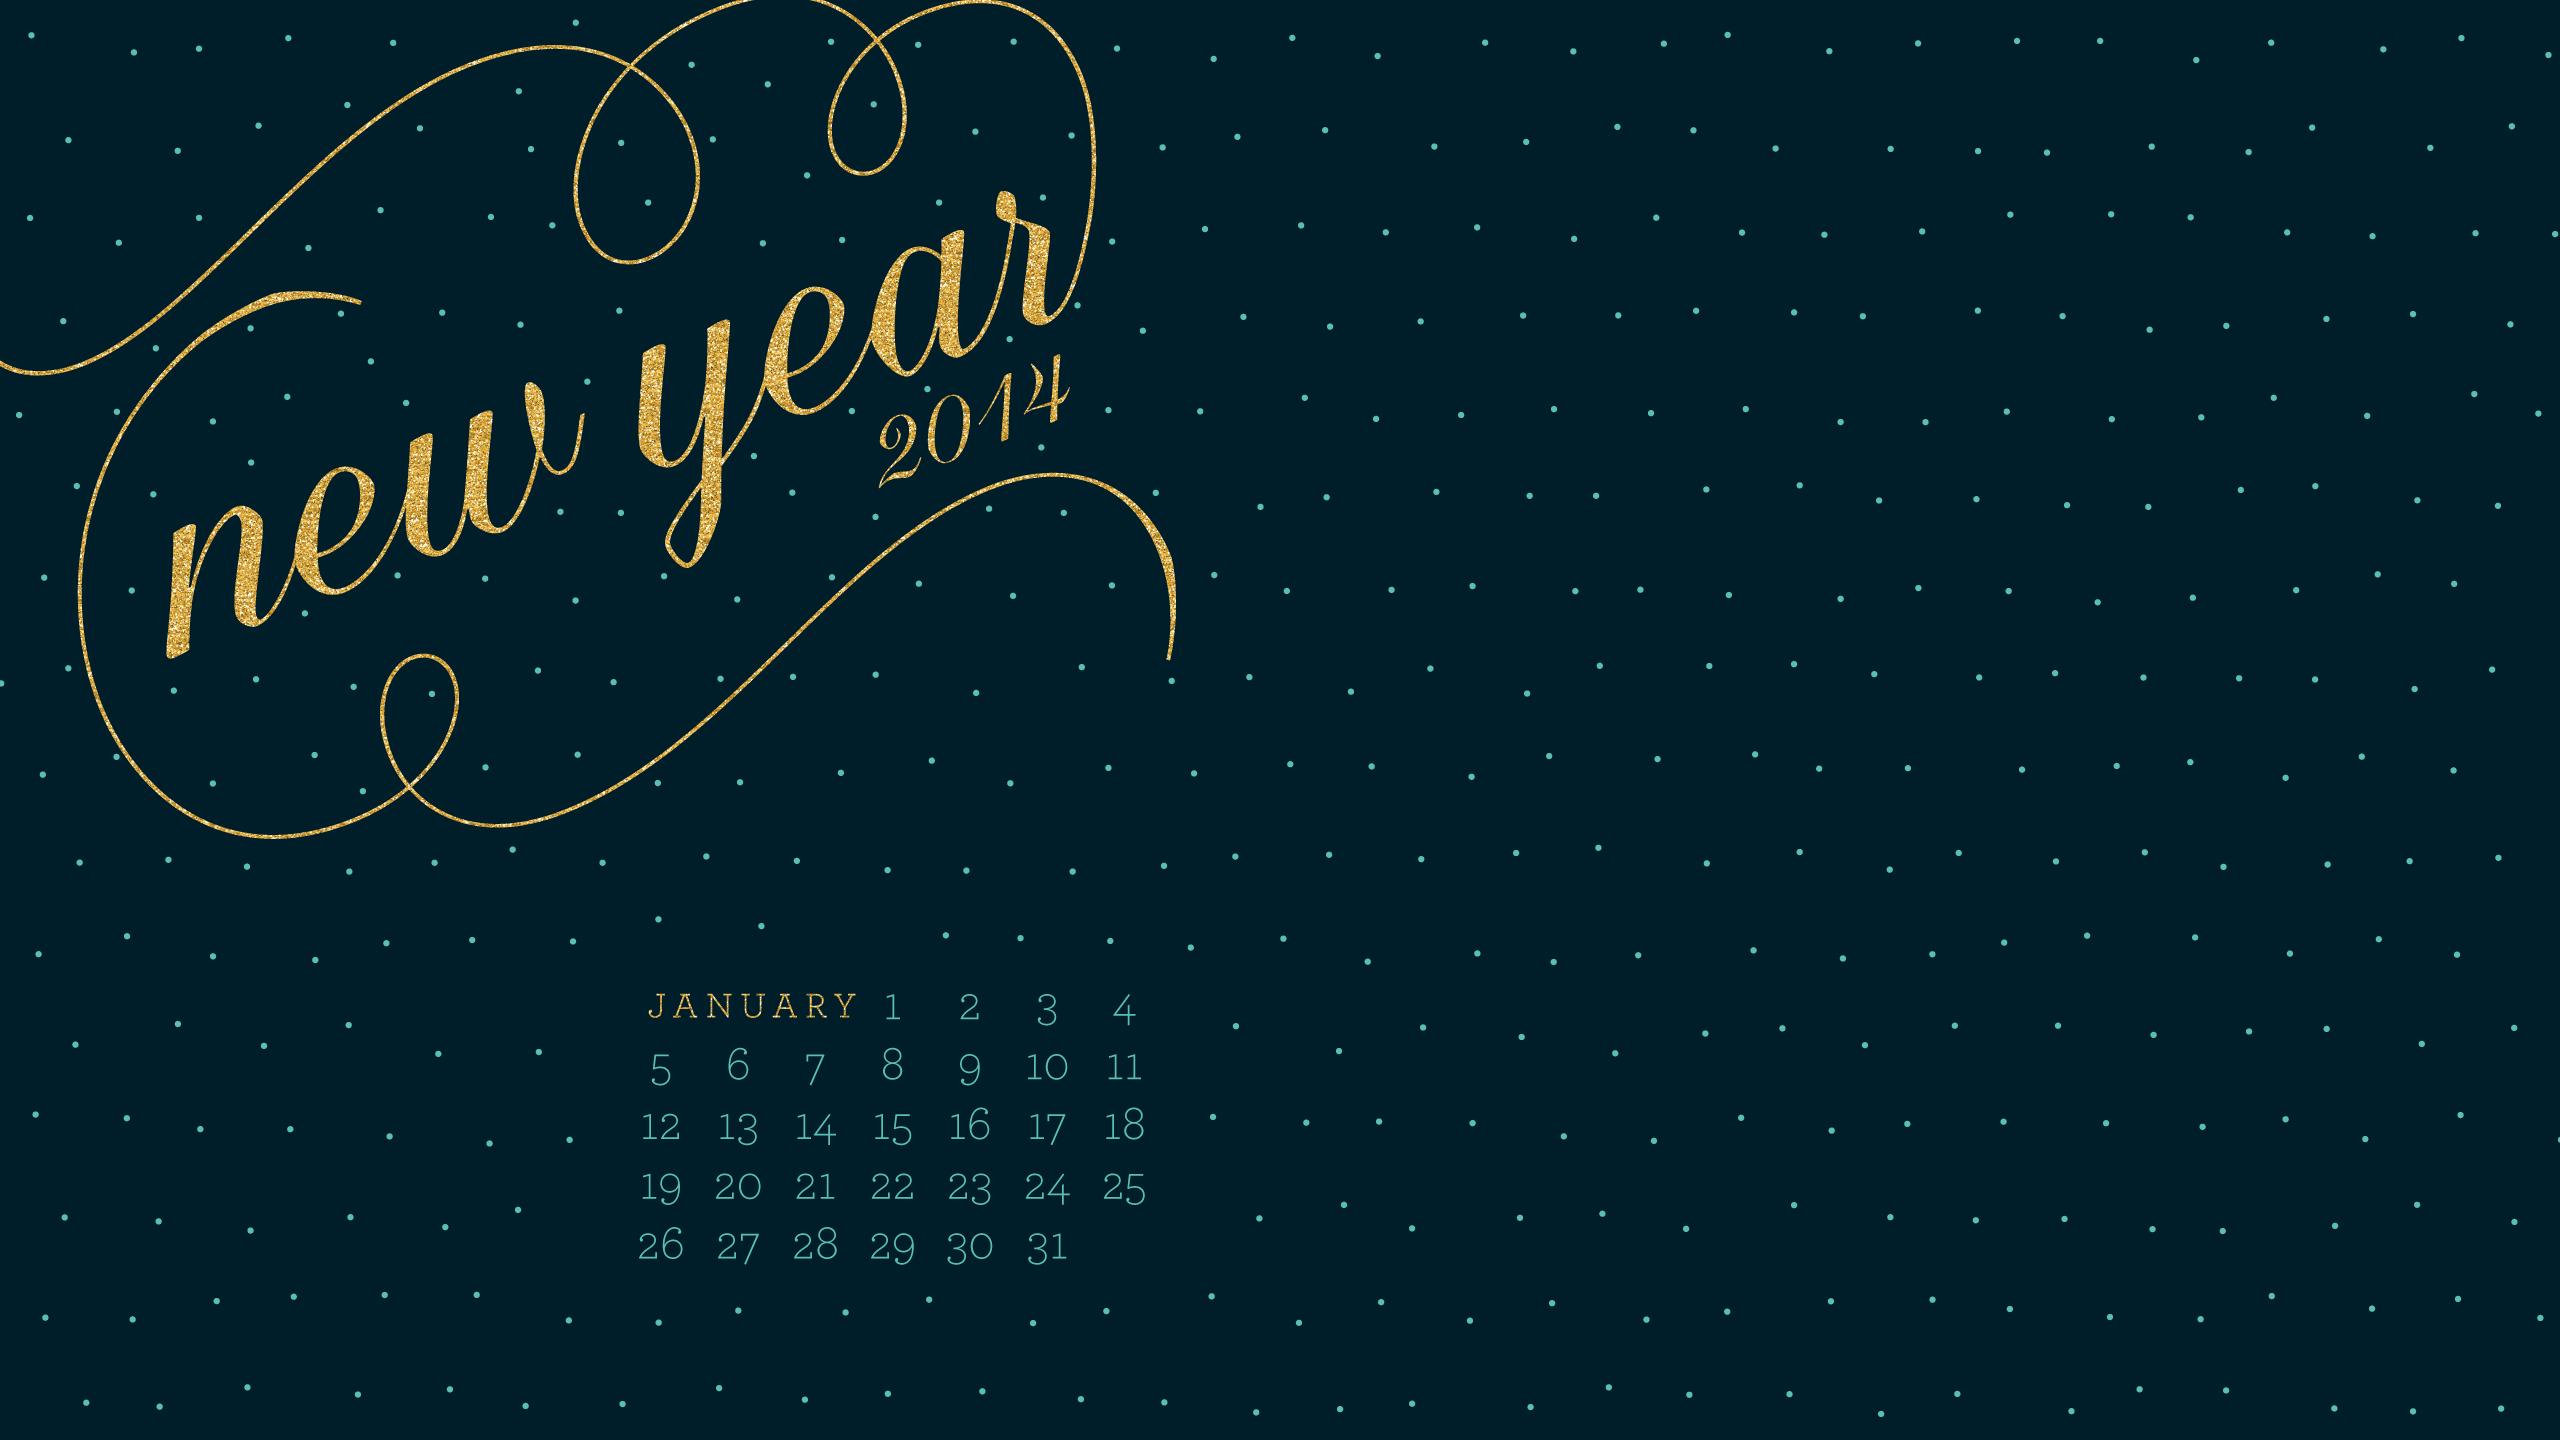 Free Calendar Wallpaper January : Free desktop wallpapers wallpaper cave